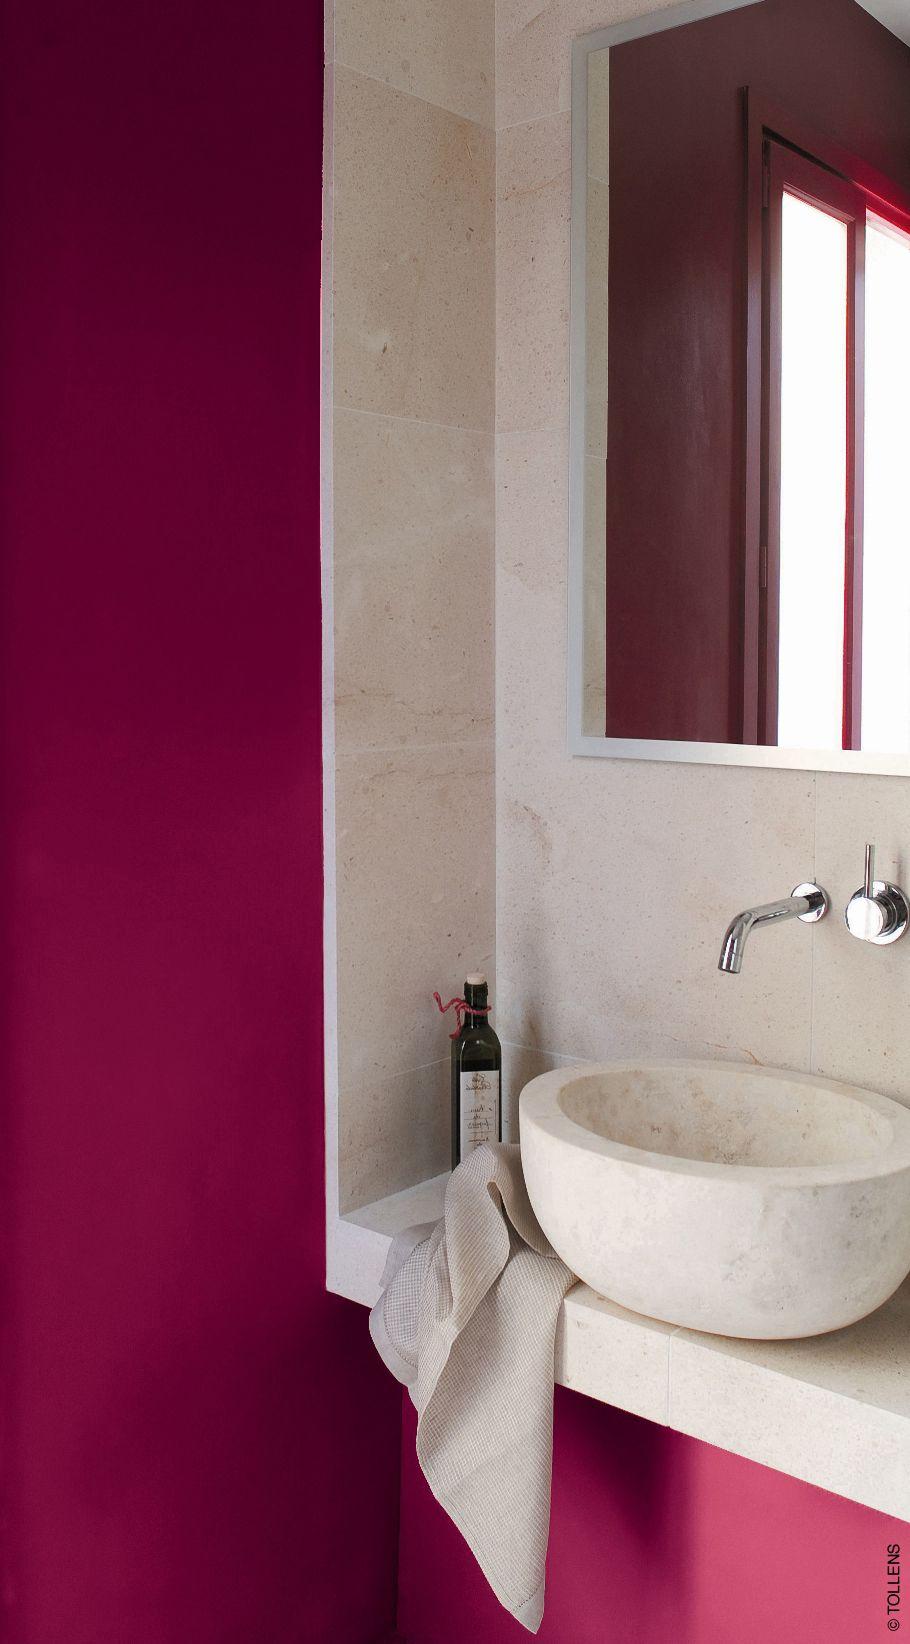 mur peinture rouge griotte by tollens et vasque et dalle. Black Bedroom Furniture Sets. Home Design Ideas